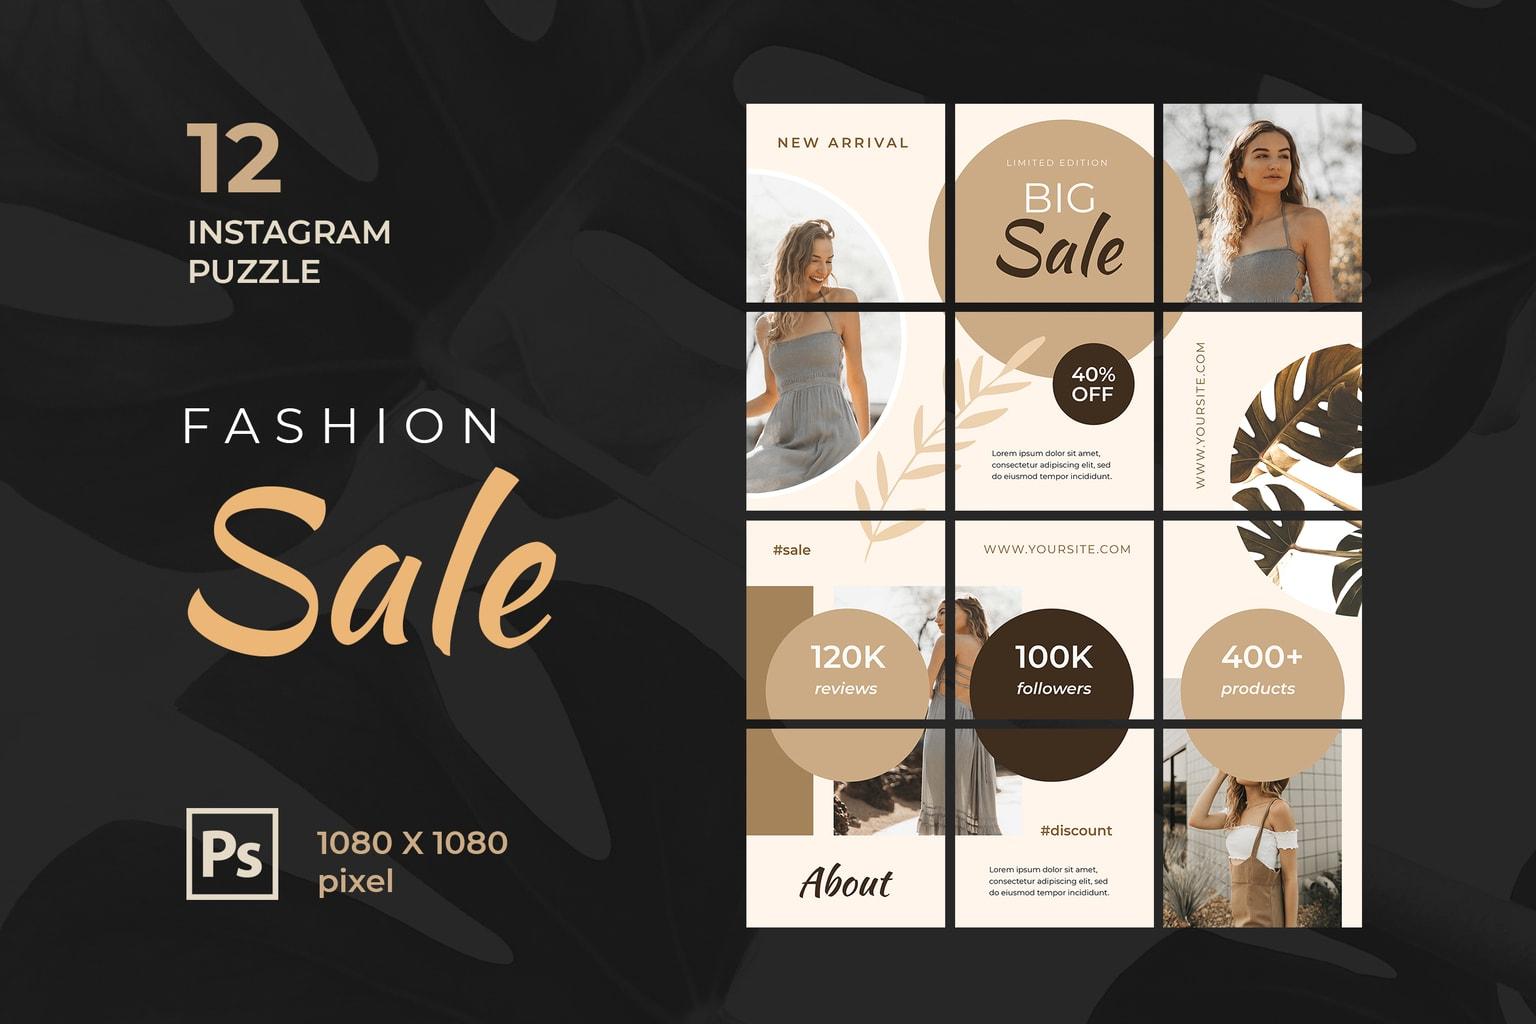 Instagram Puzzle - Big Fashion Sale